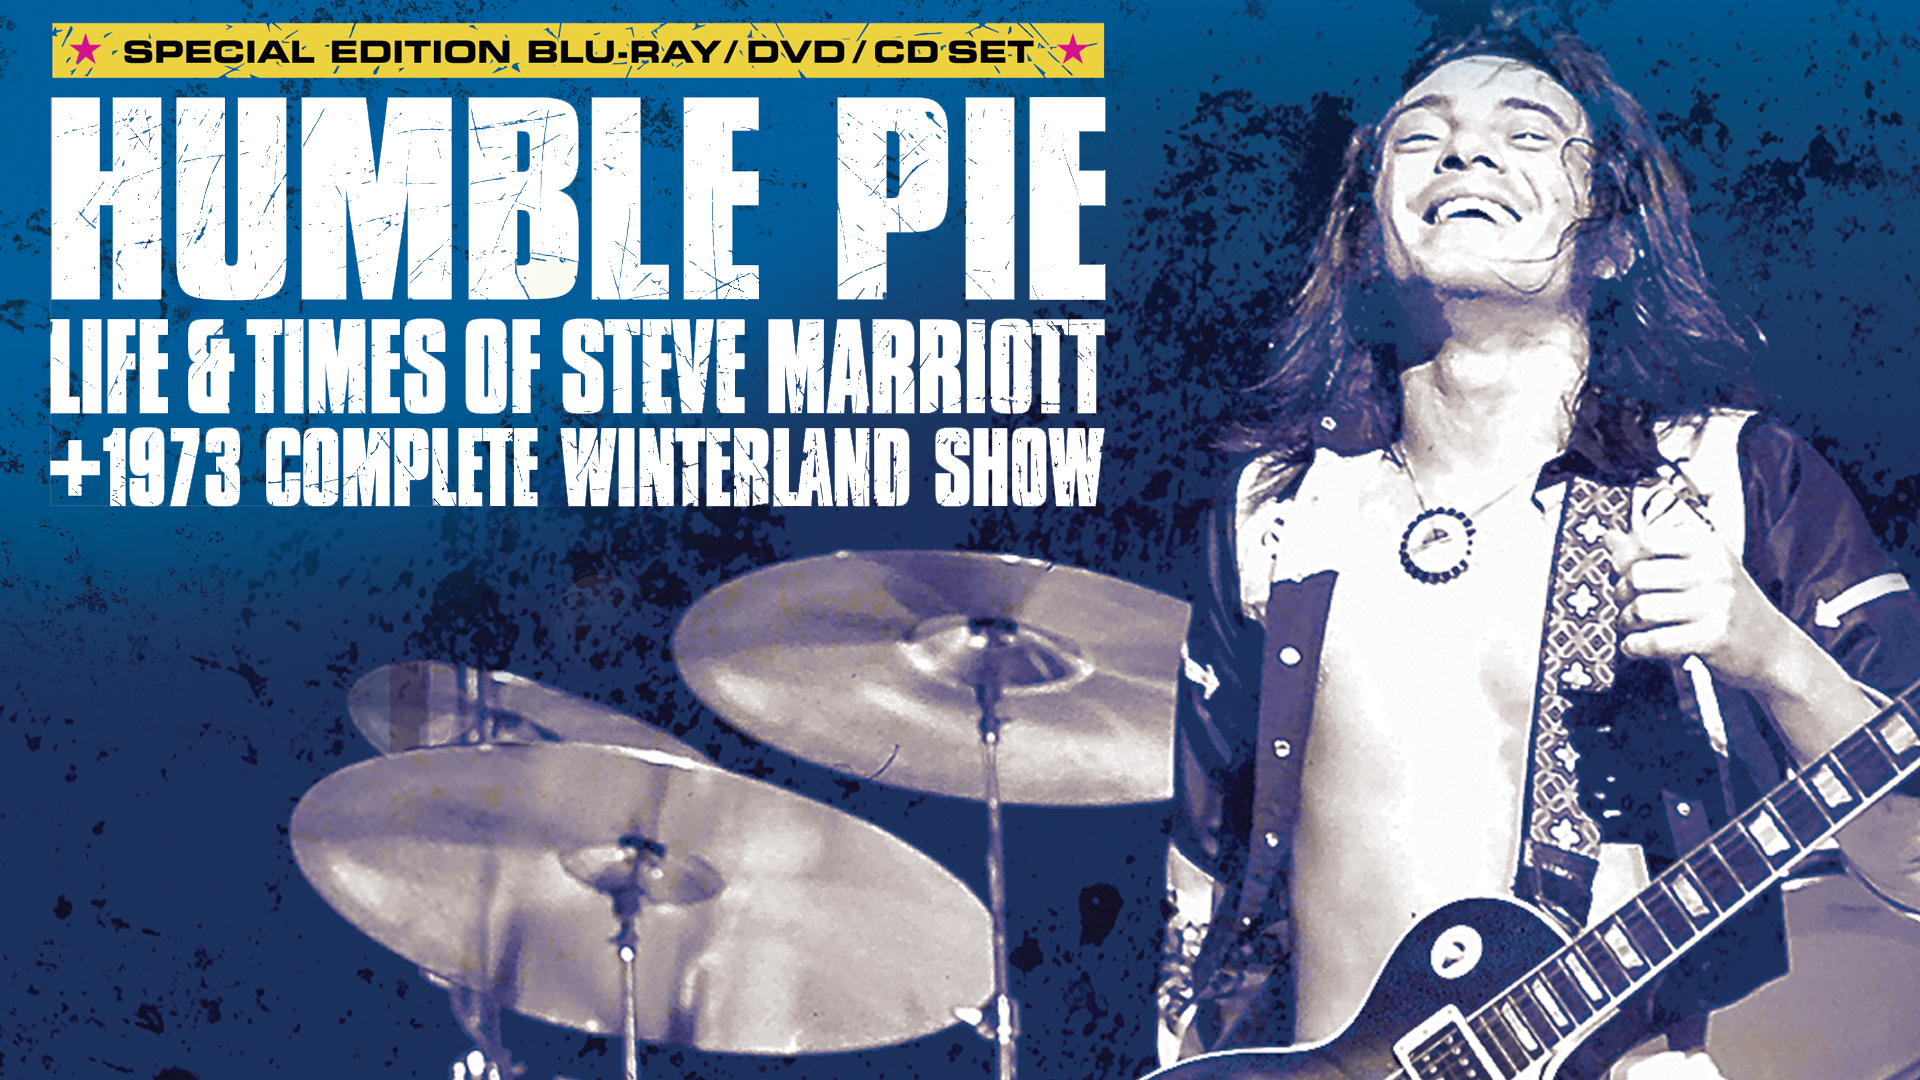 Steve Marriott - Humble Pie: Life And Times Of Steve Marriott